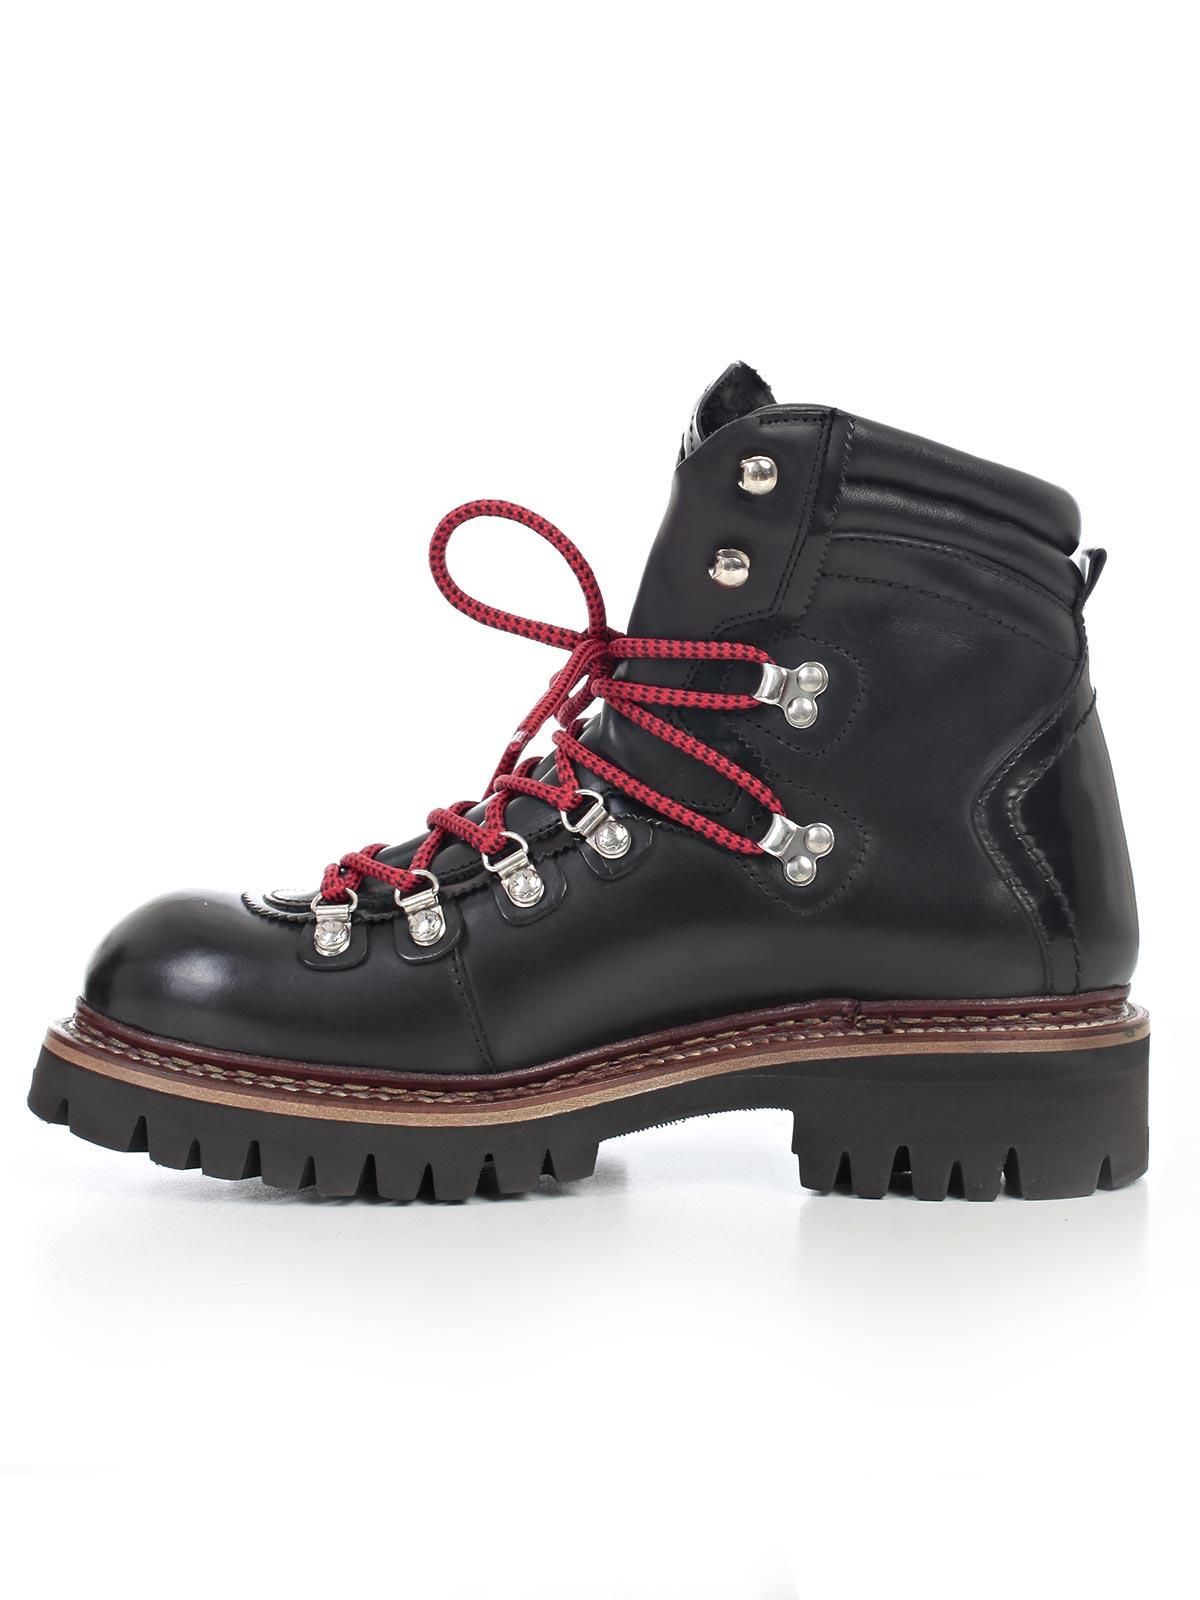 5cf0fb419911ea Dsquared2 Boots W17LA102.291.2124 - 2124 BLACK.Bernardelli Store ...